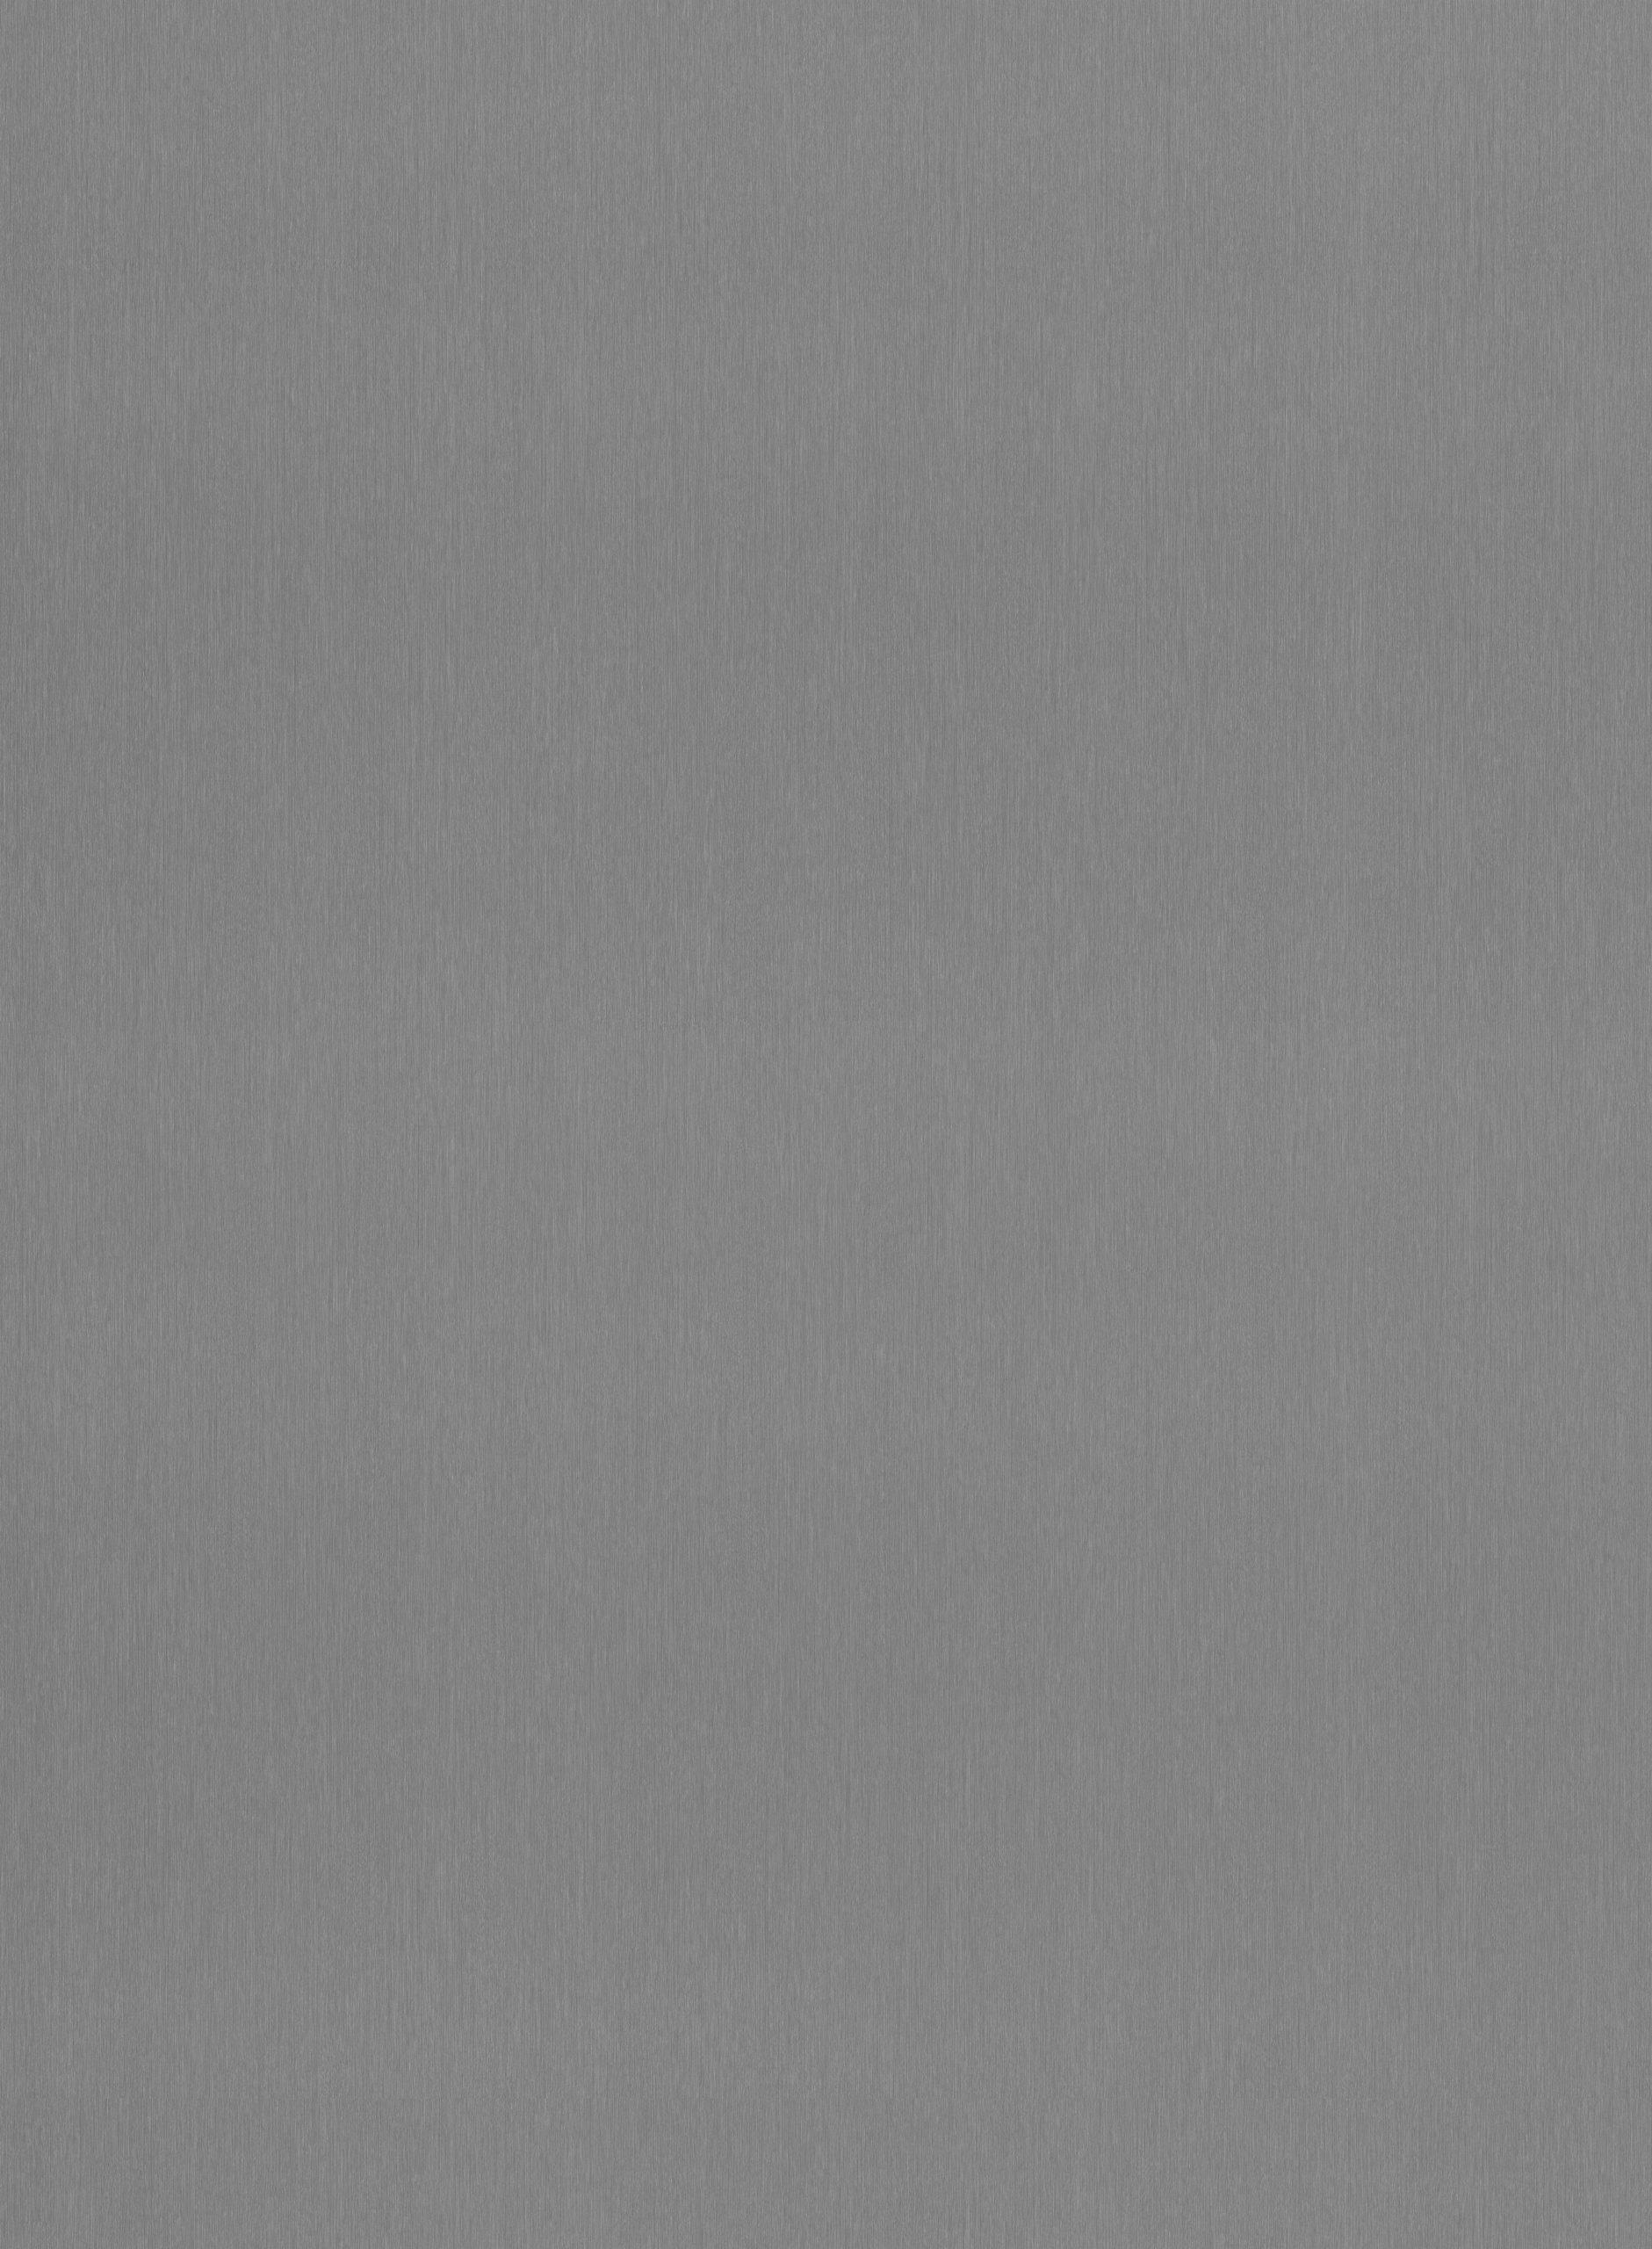 DecoLegno FA08 Reflex hele plaat afb. 2800x2070 mm /Tekenprogramma